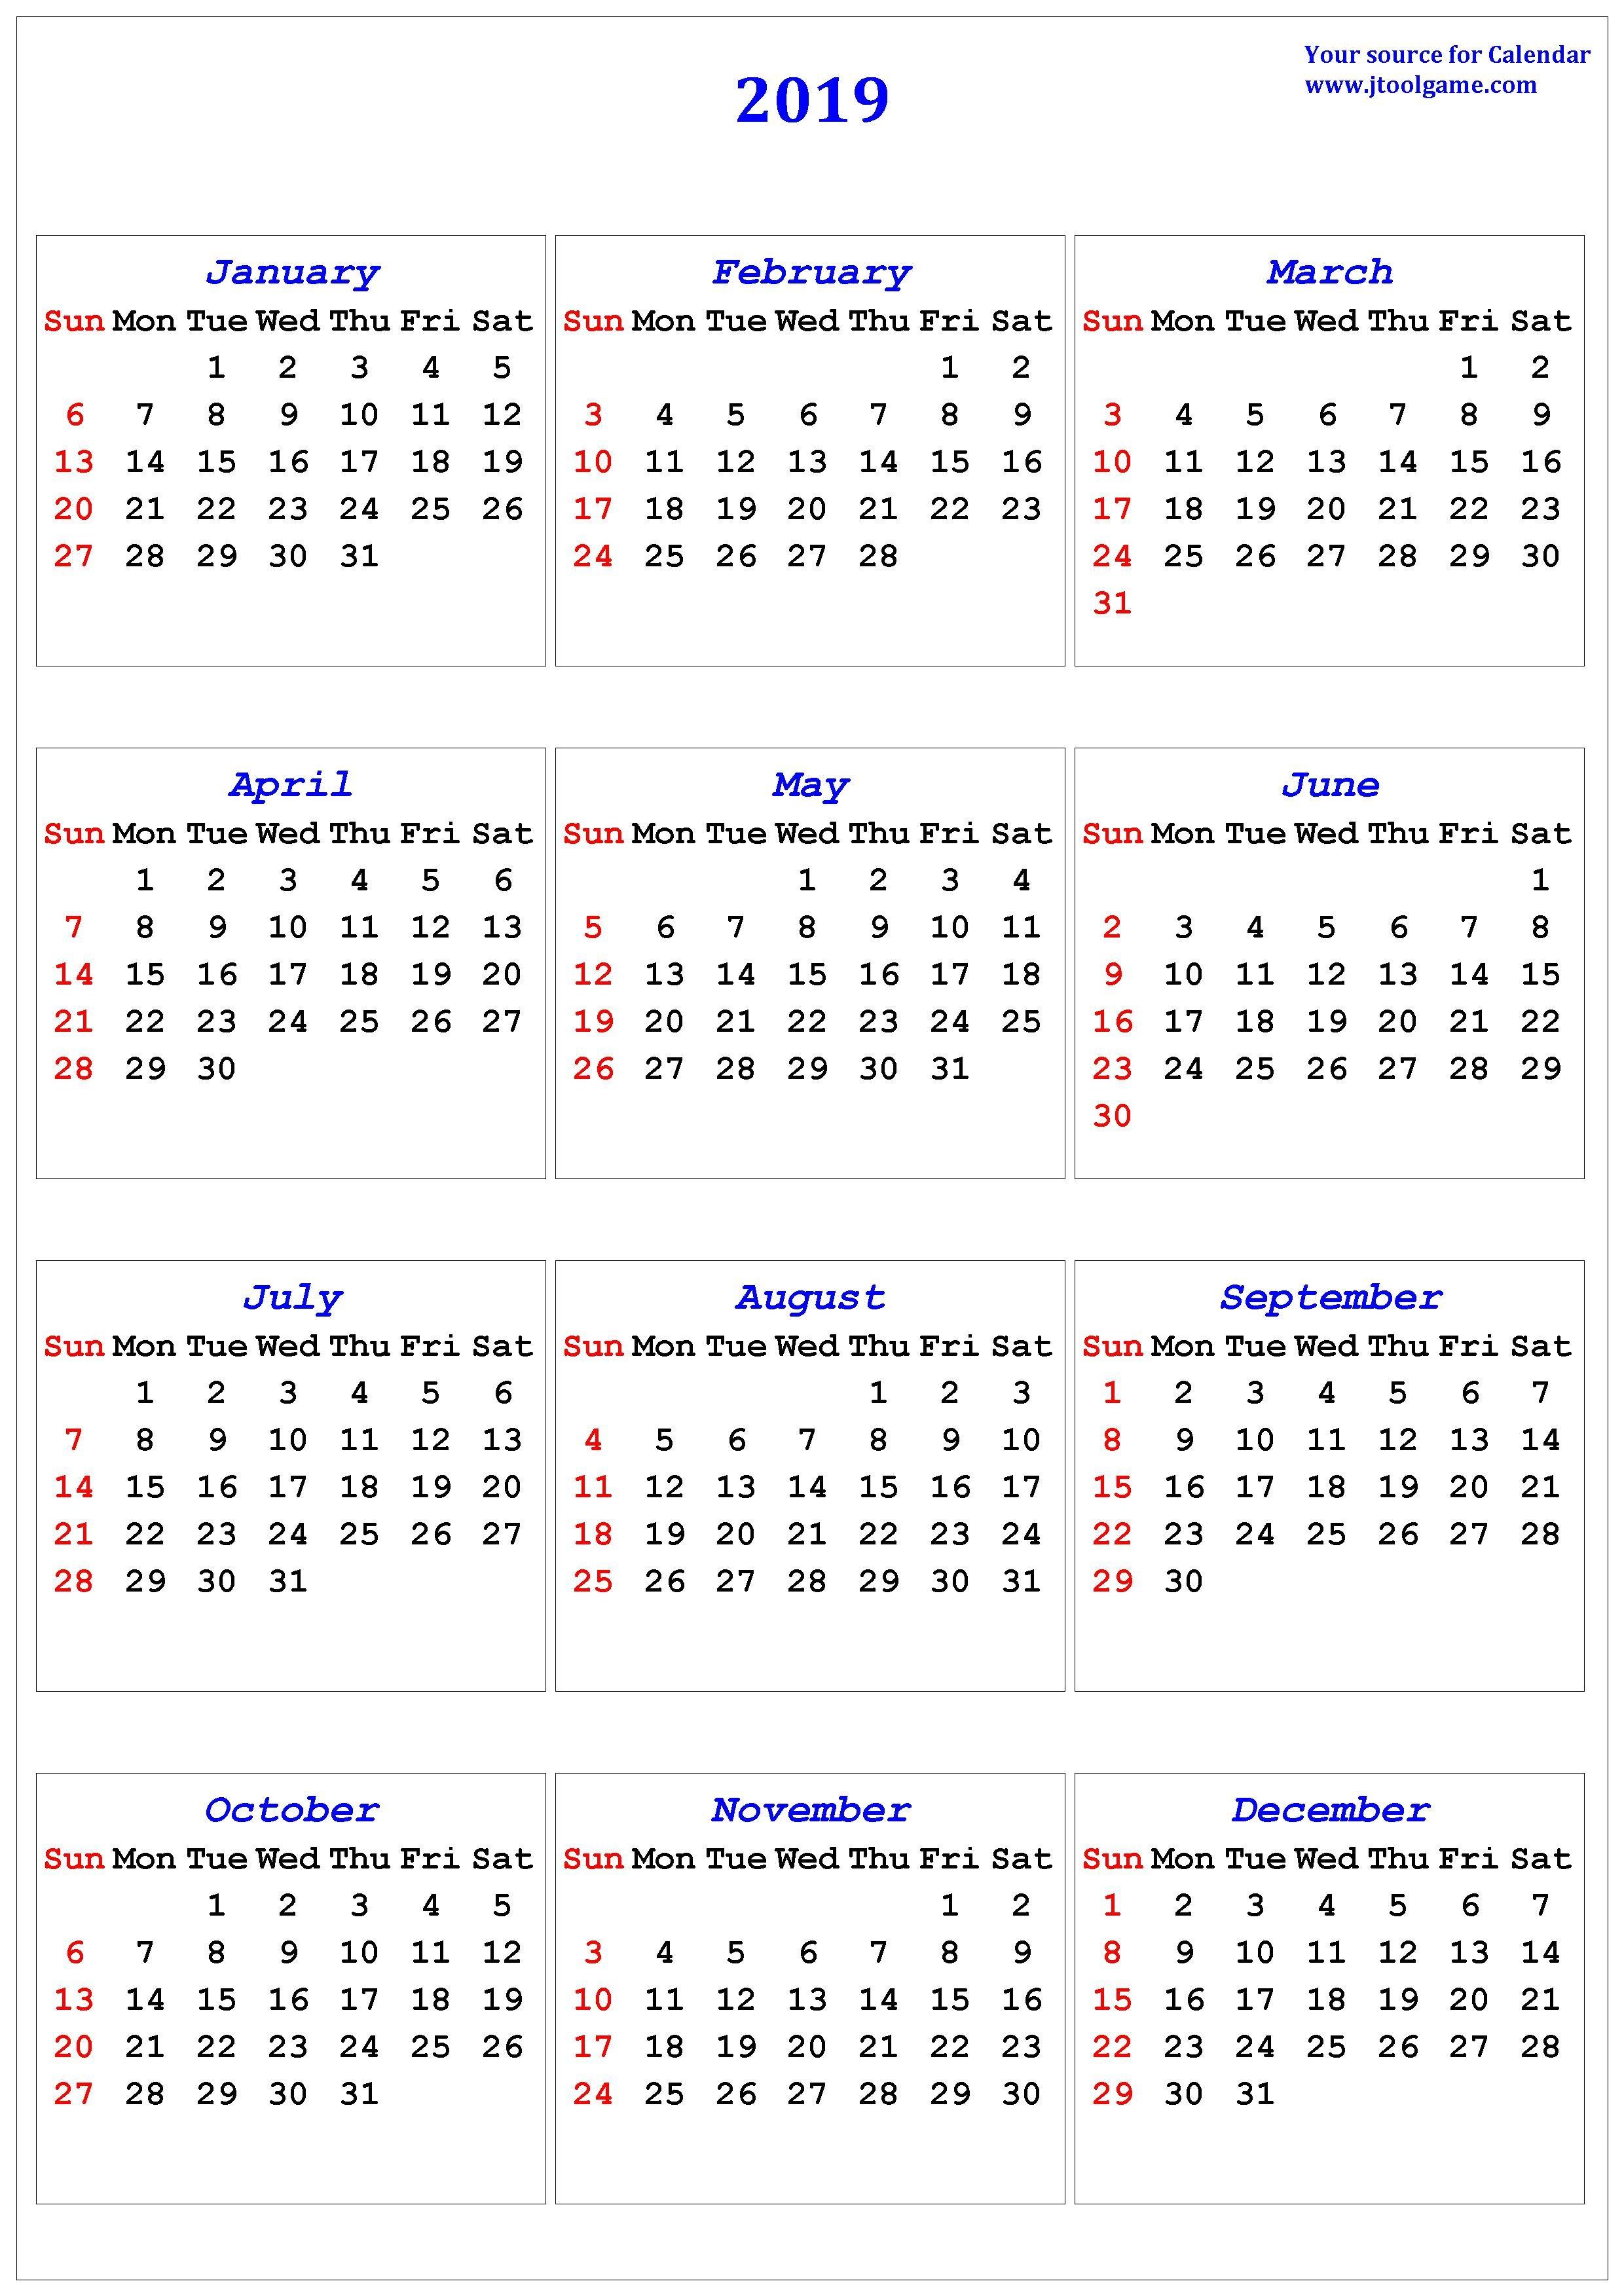 2019 Calendar – Printable Calendar. 2019 Calendar In Multiple Colors Calendar 2019 United States